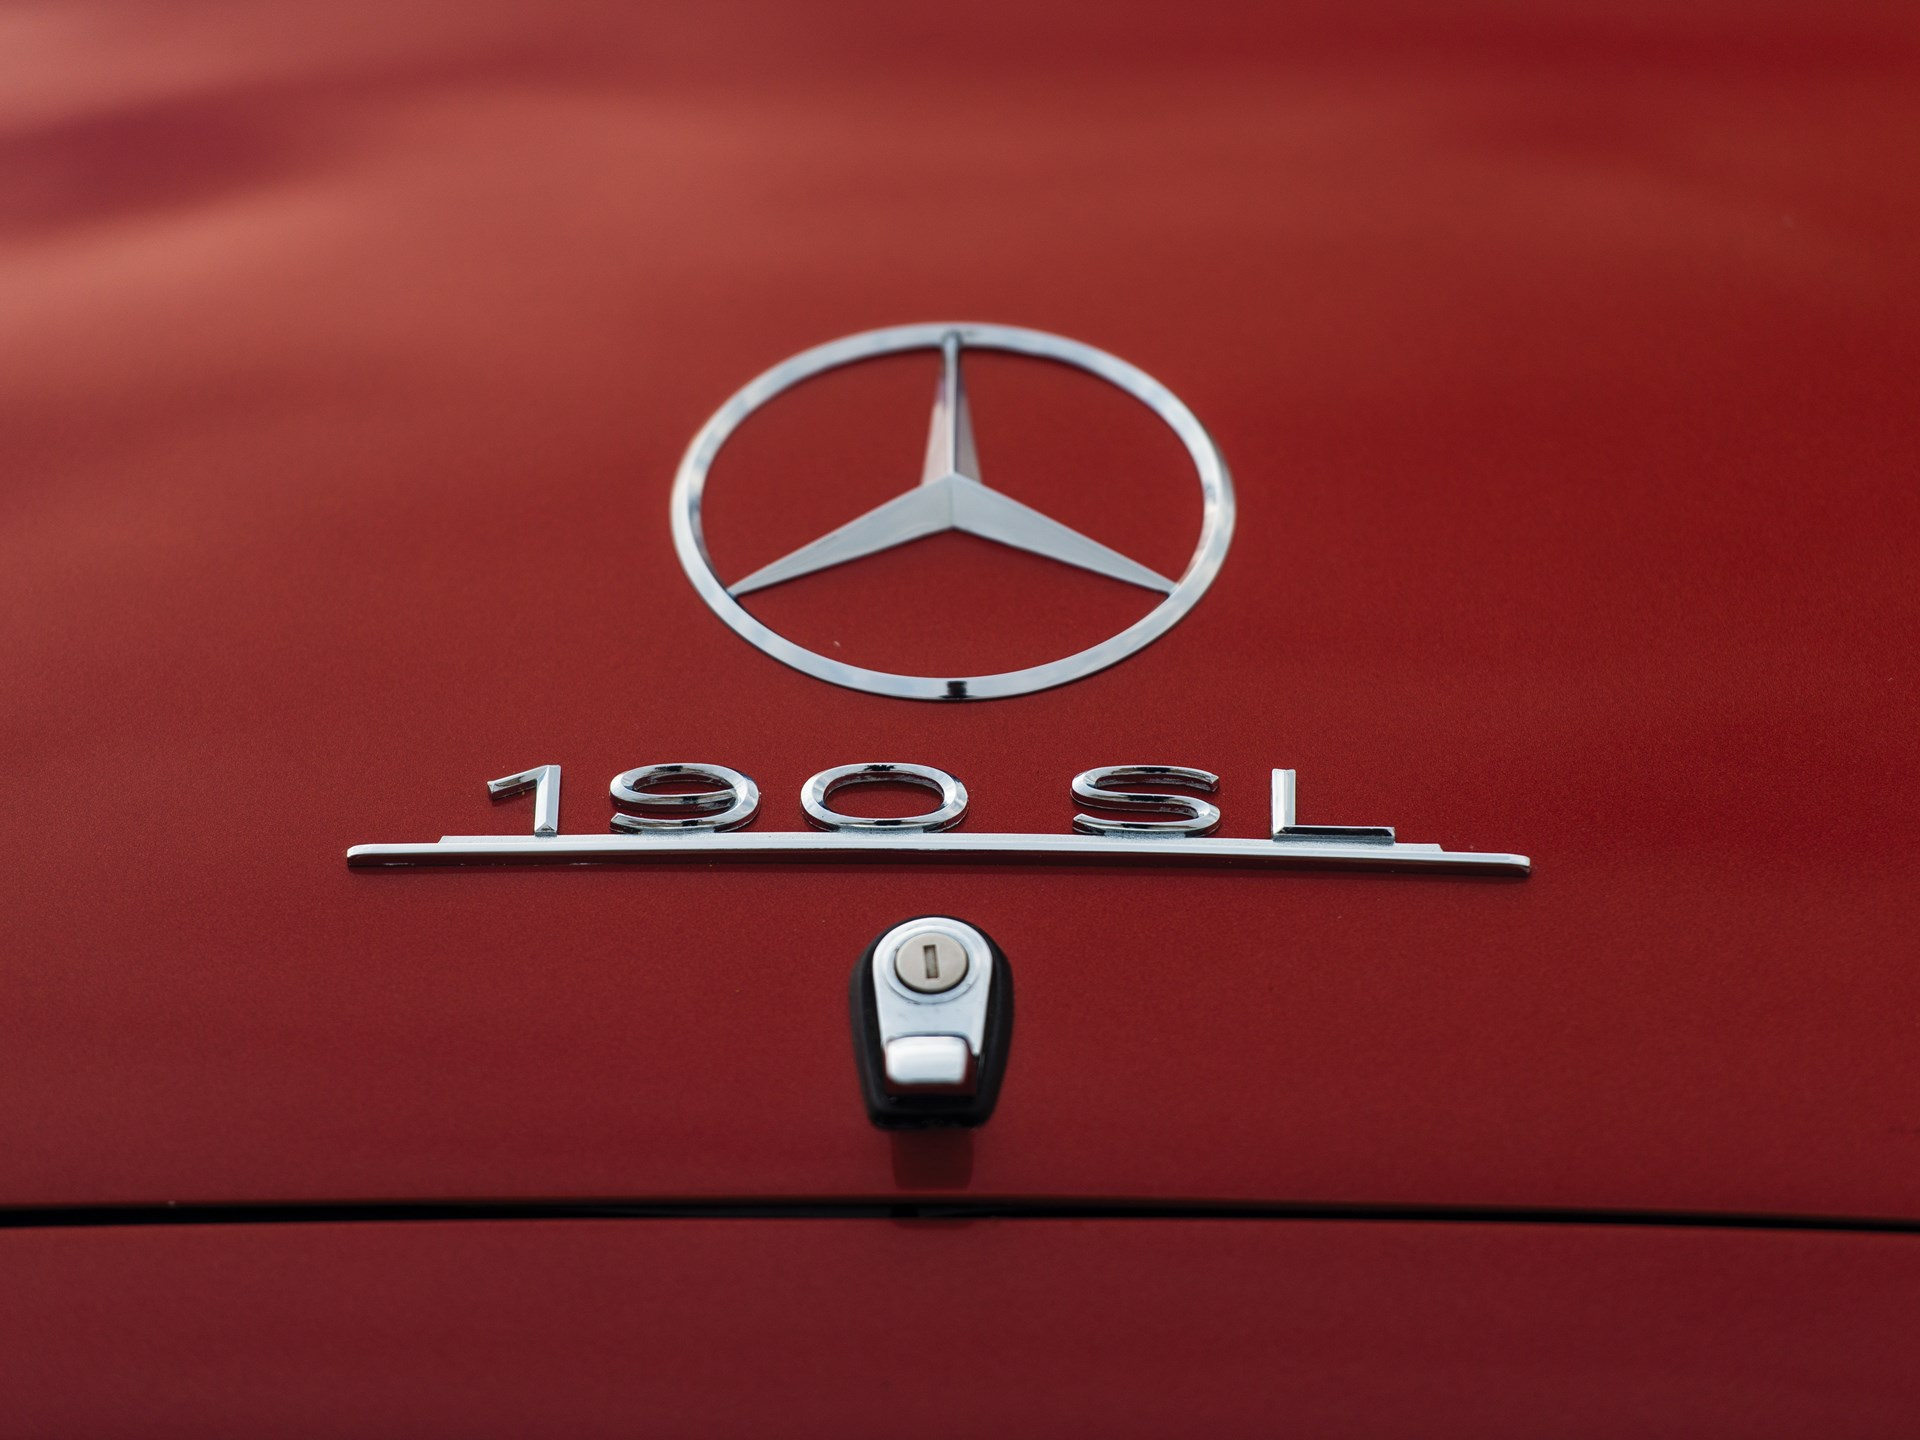 Awe Inspiring Rm Sothebys 1959 Mercedes Benz 190 Sl Arizona 2019 Wiring Digital Resources Millslowmaporg